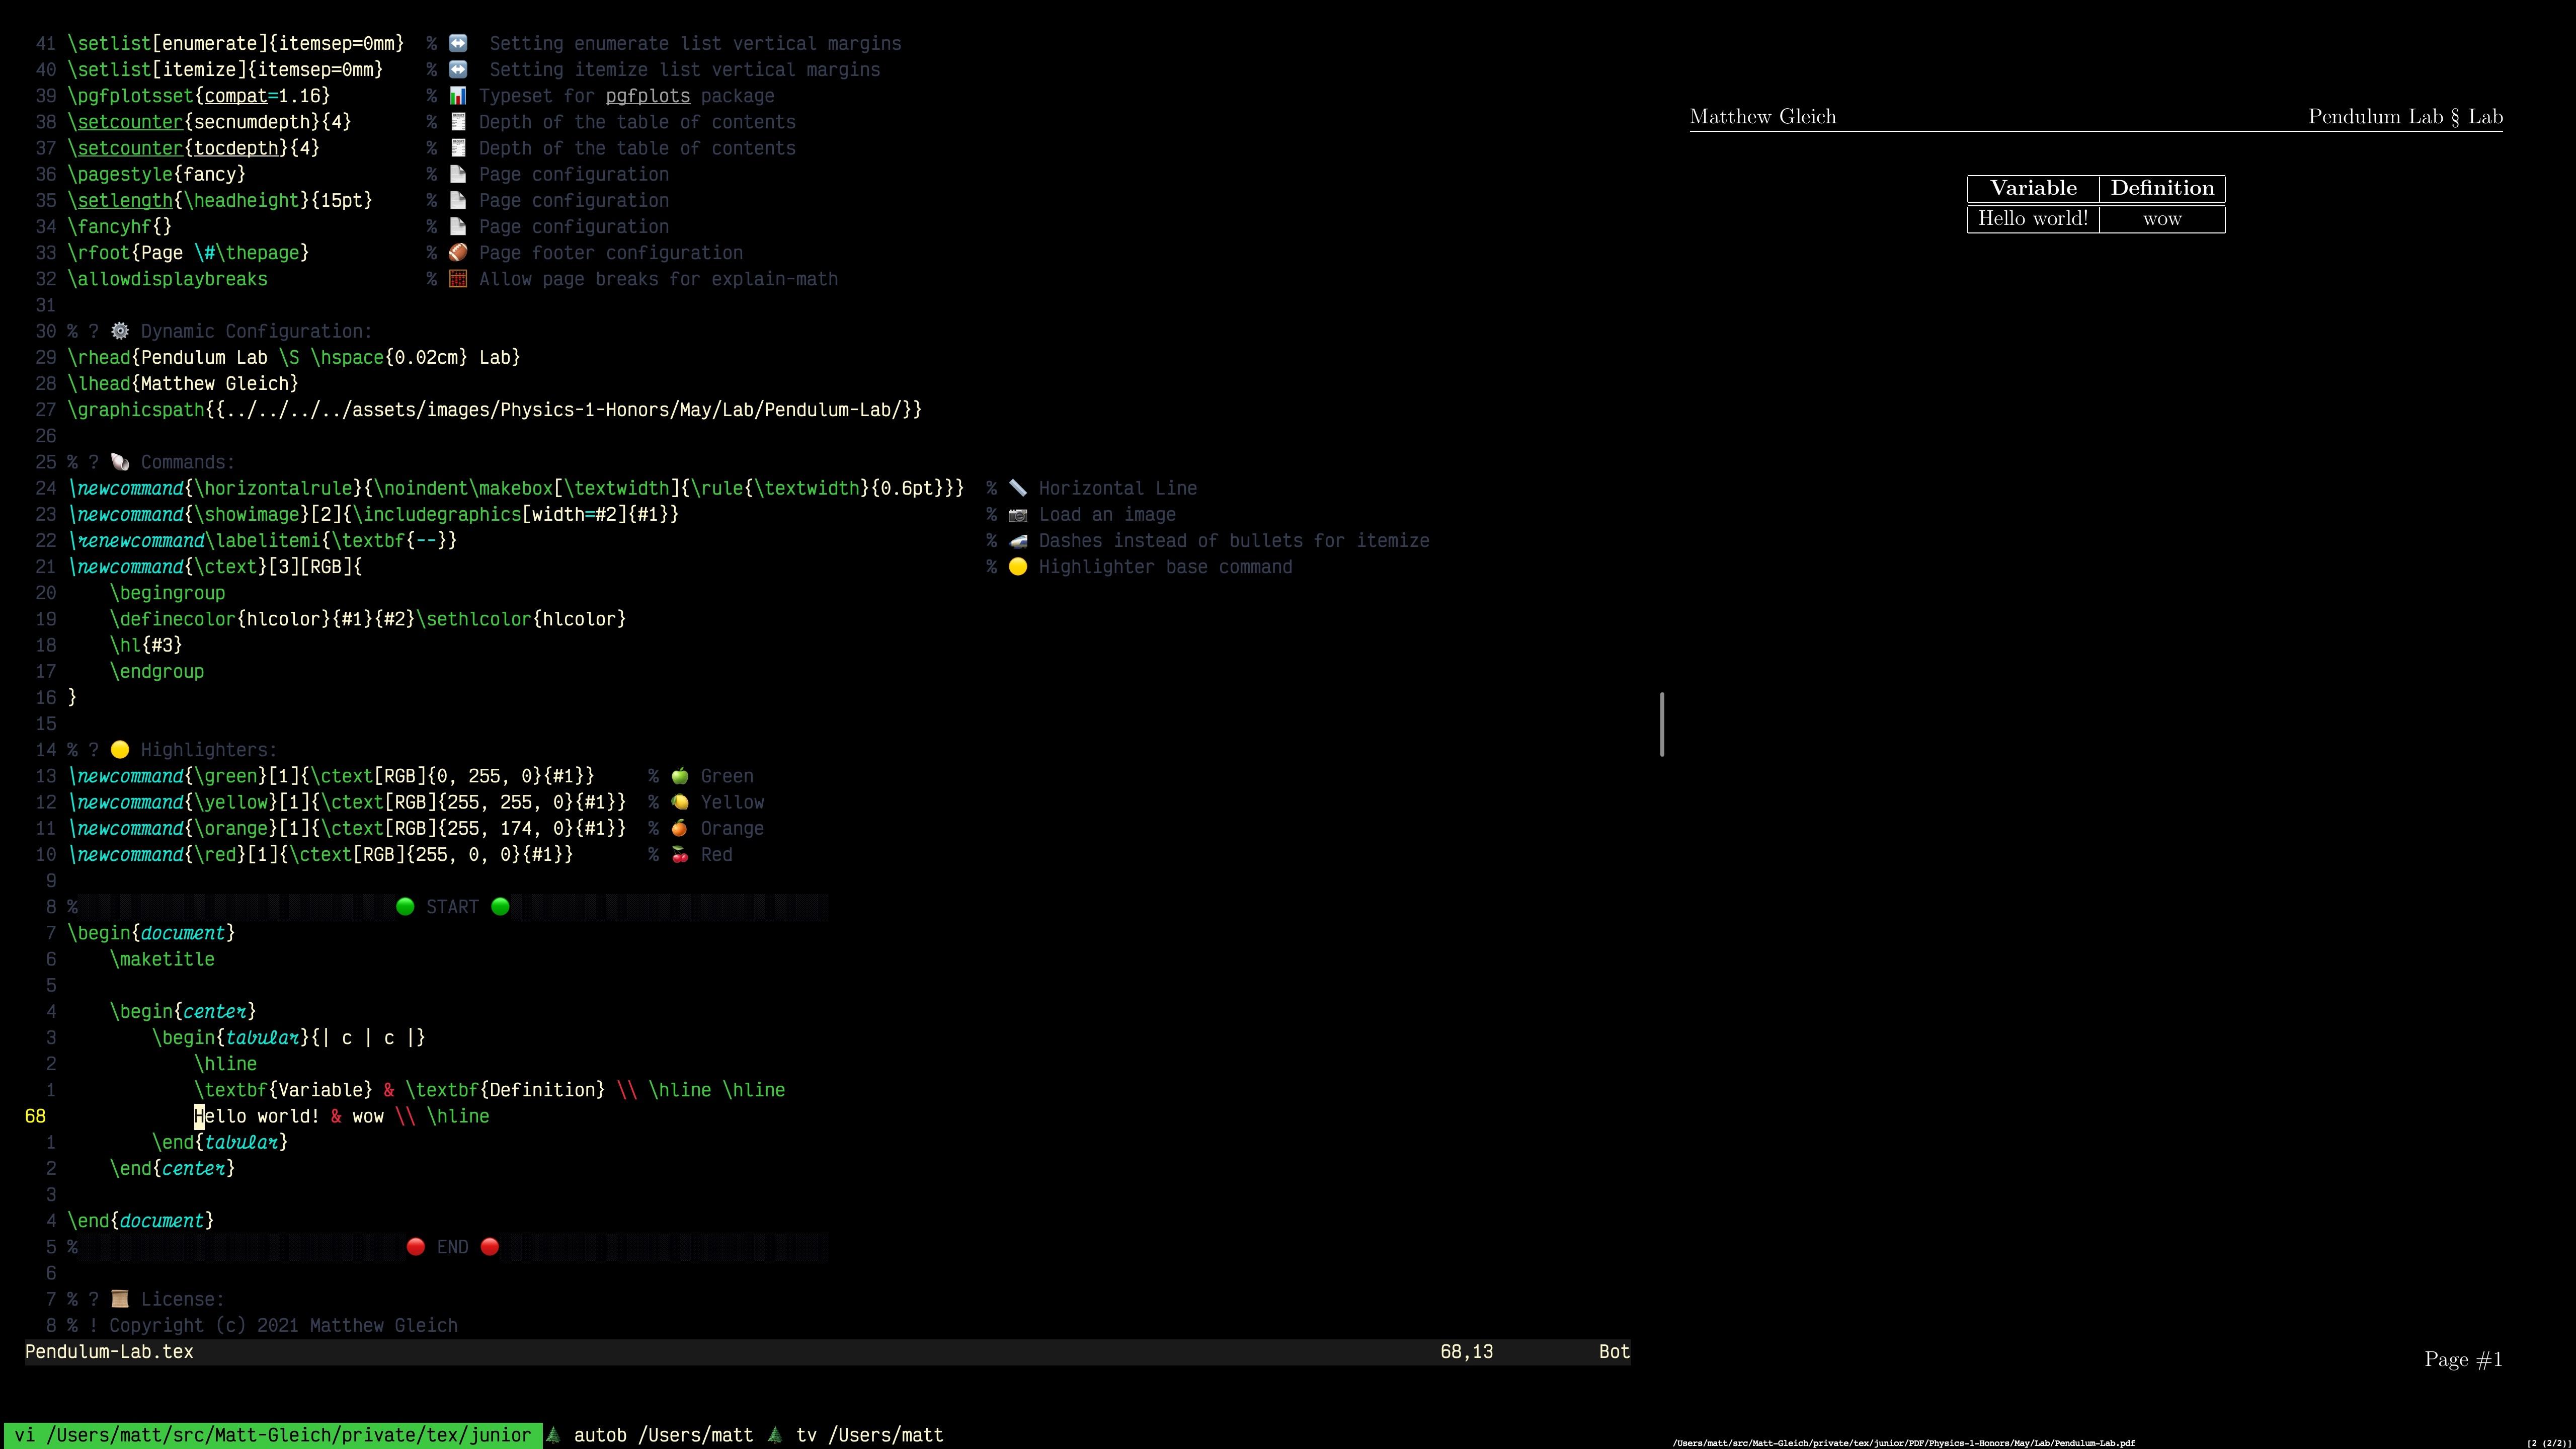 https://cloud-elqqdz753-hack-club-bot.vercel.app/0screen_shot_2021-05-17_at_11.29.29_pm.jpg